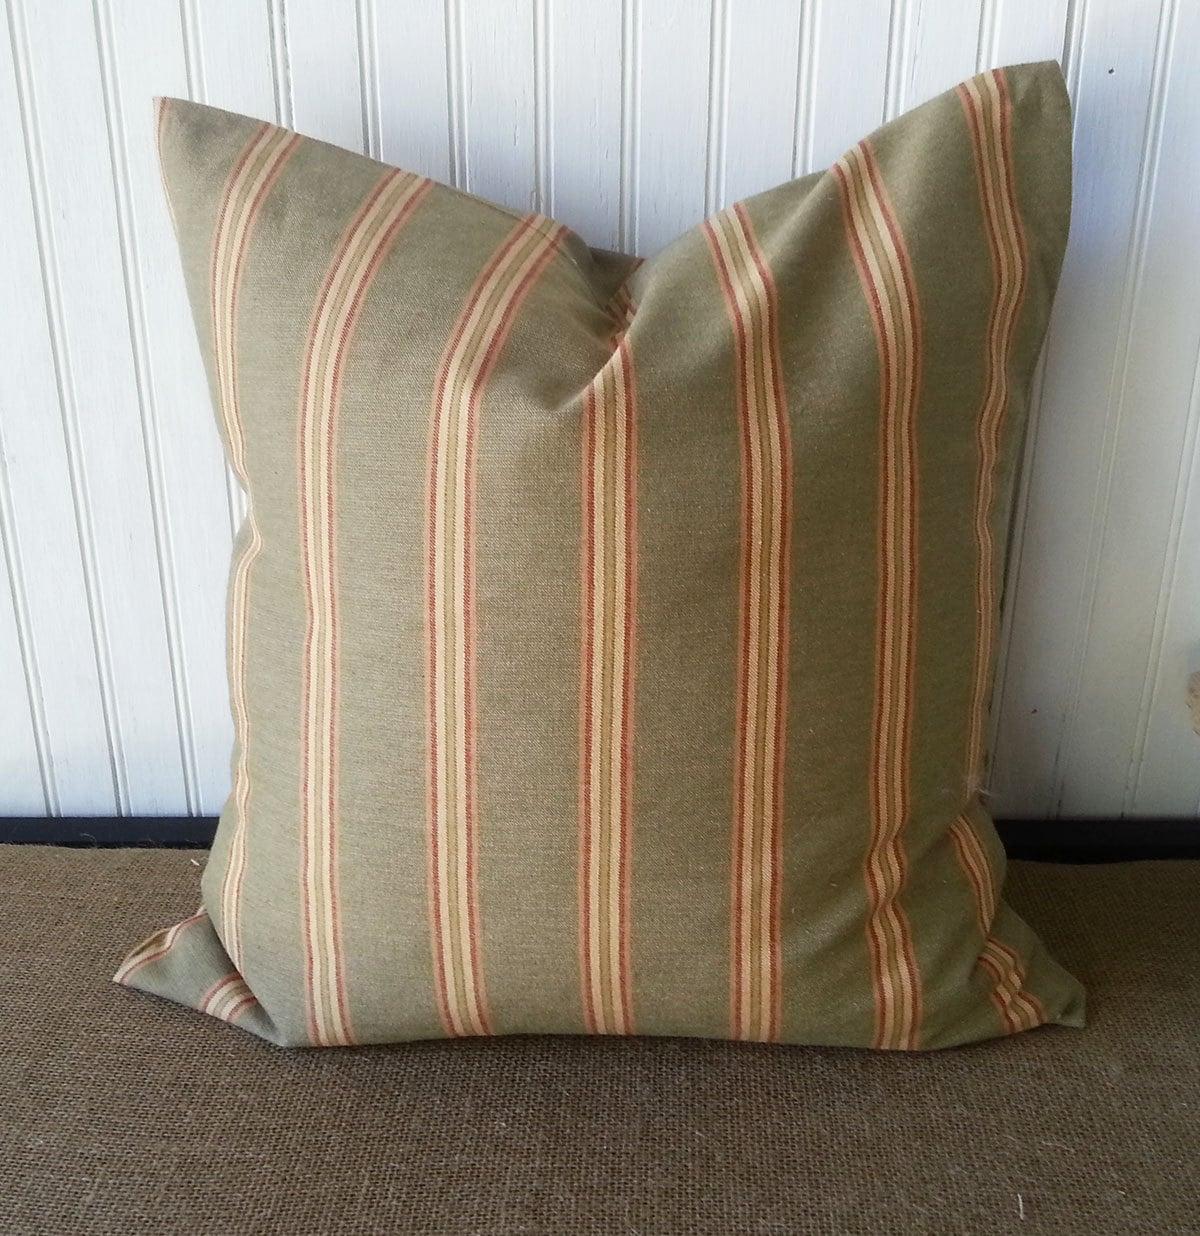 Throw Pillow Covers Farmhouse : Farmhouse Rustic Pillow Striped Pillow 18 x 18 Pillow